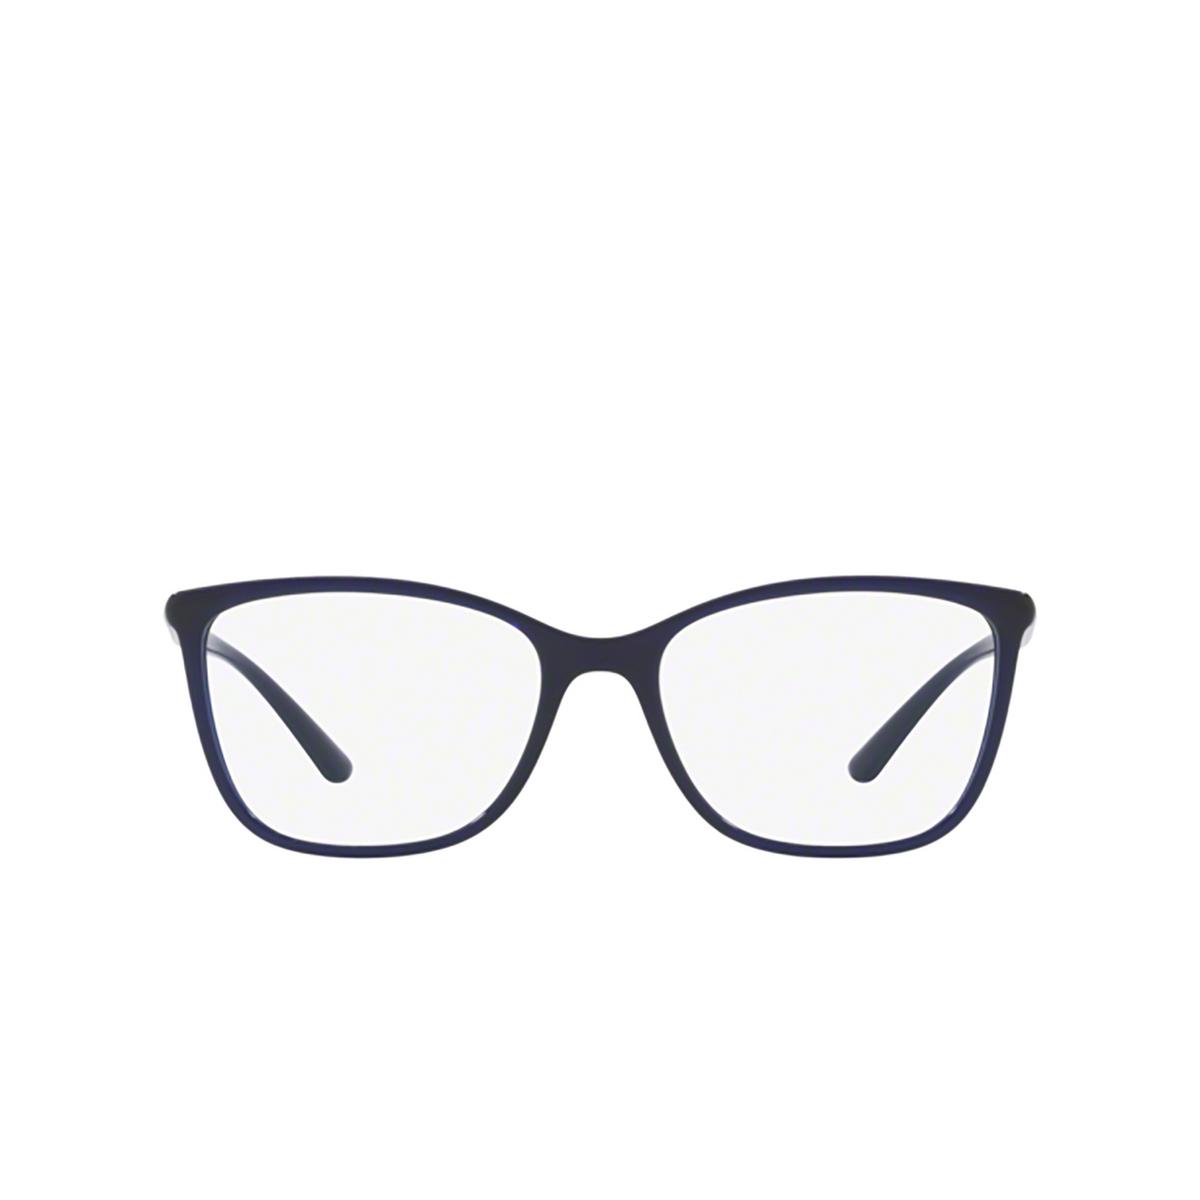 Dolce & Gabbana® Rectangle Eyeglasses: DG5026 color Opal Blue 3094.